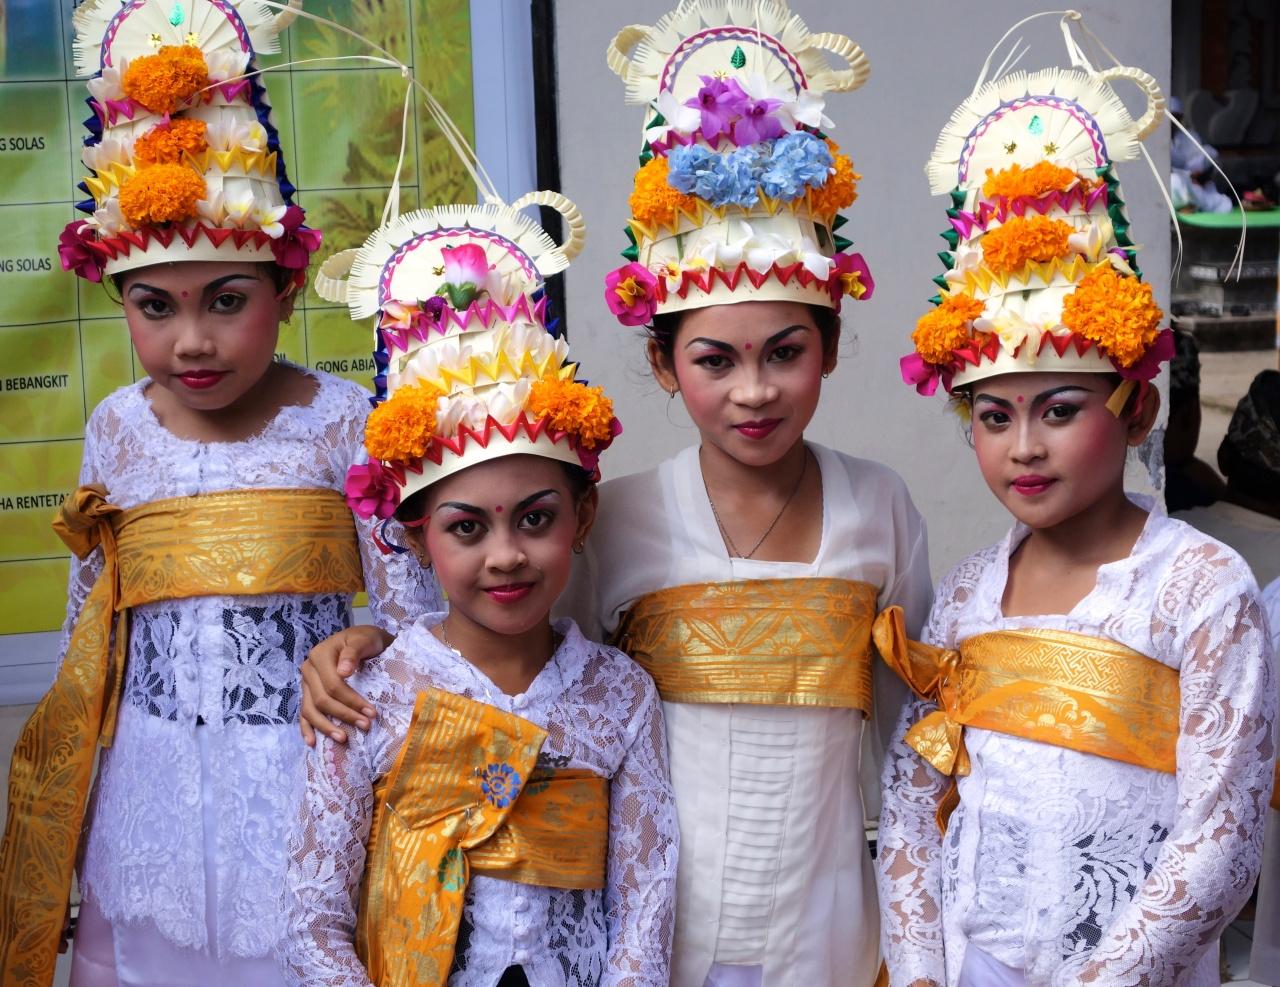 La grandeur de leurs croyances… (Bali)2014